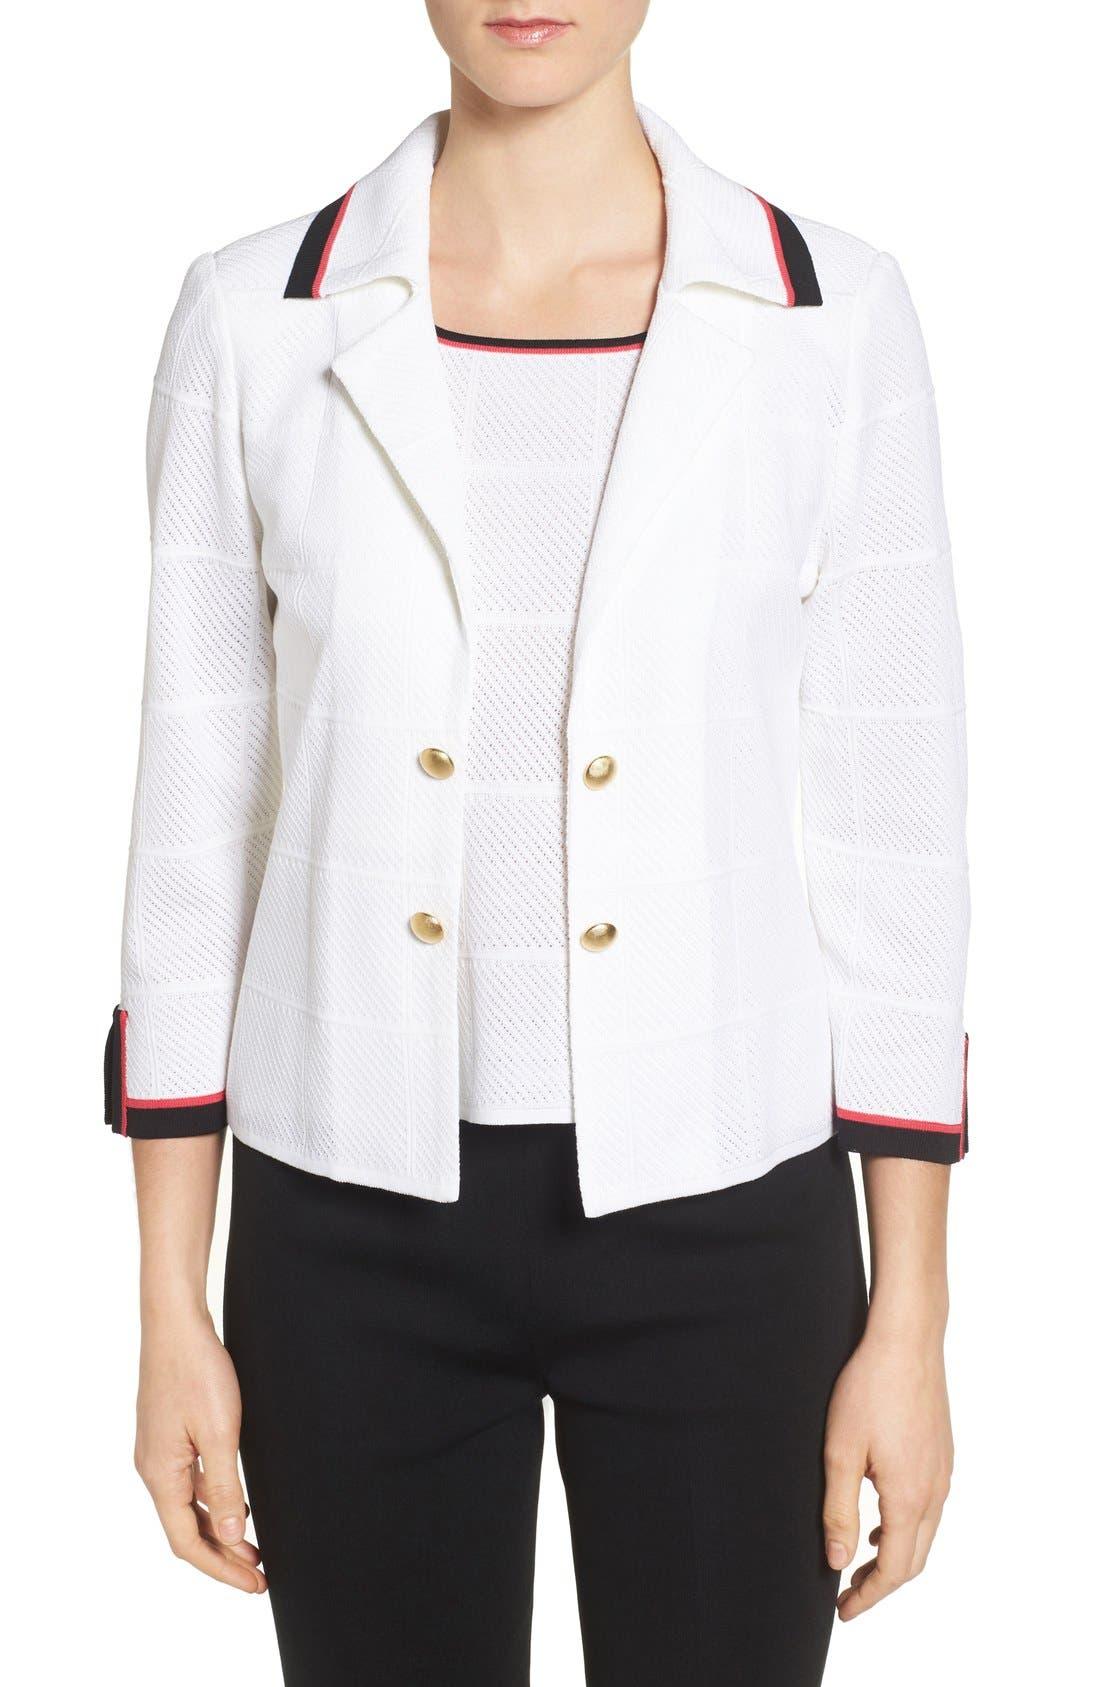 MING WANG Contrast Trim Notch Collar Jacket